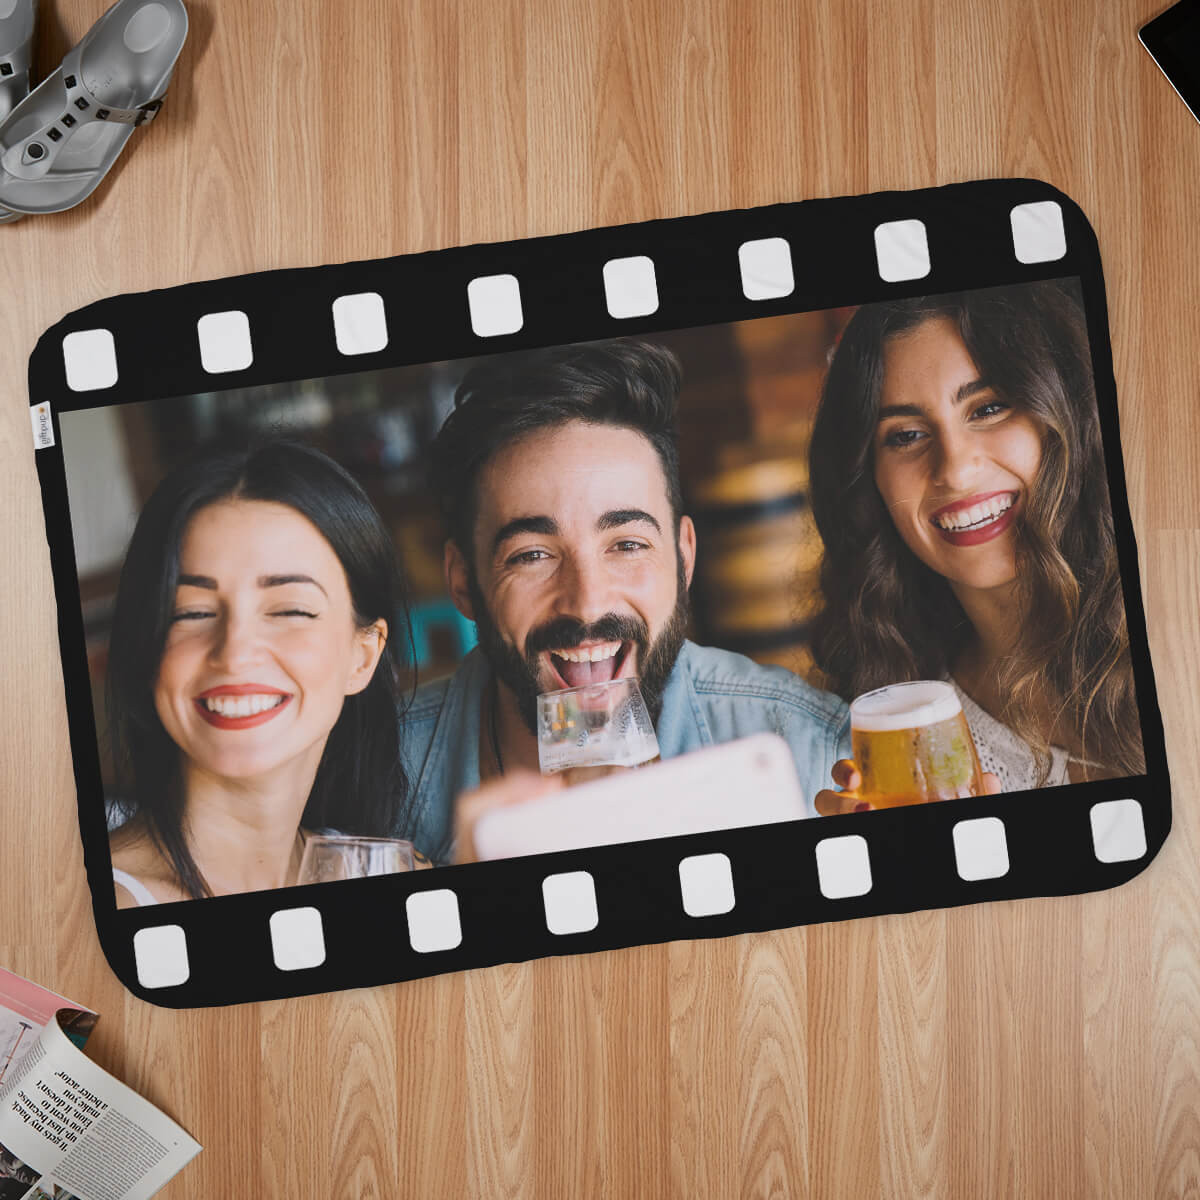 Film Strip Photo Blanket